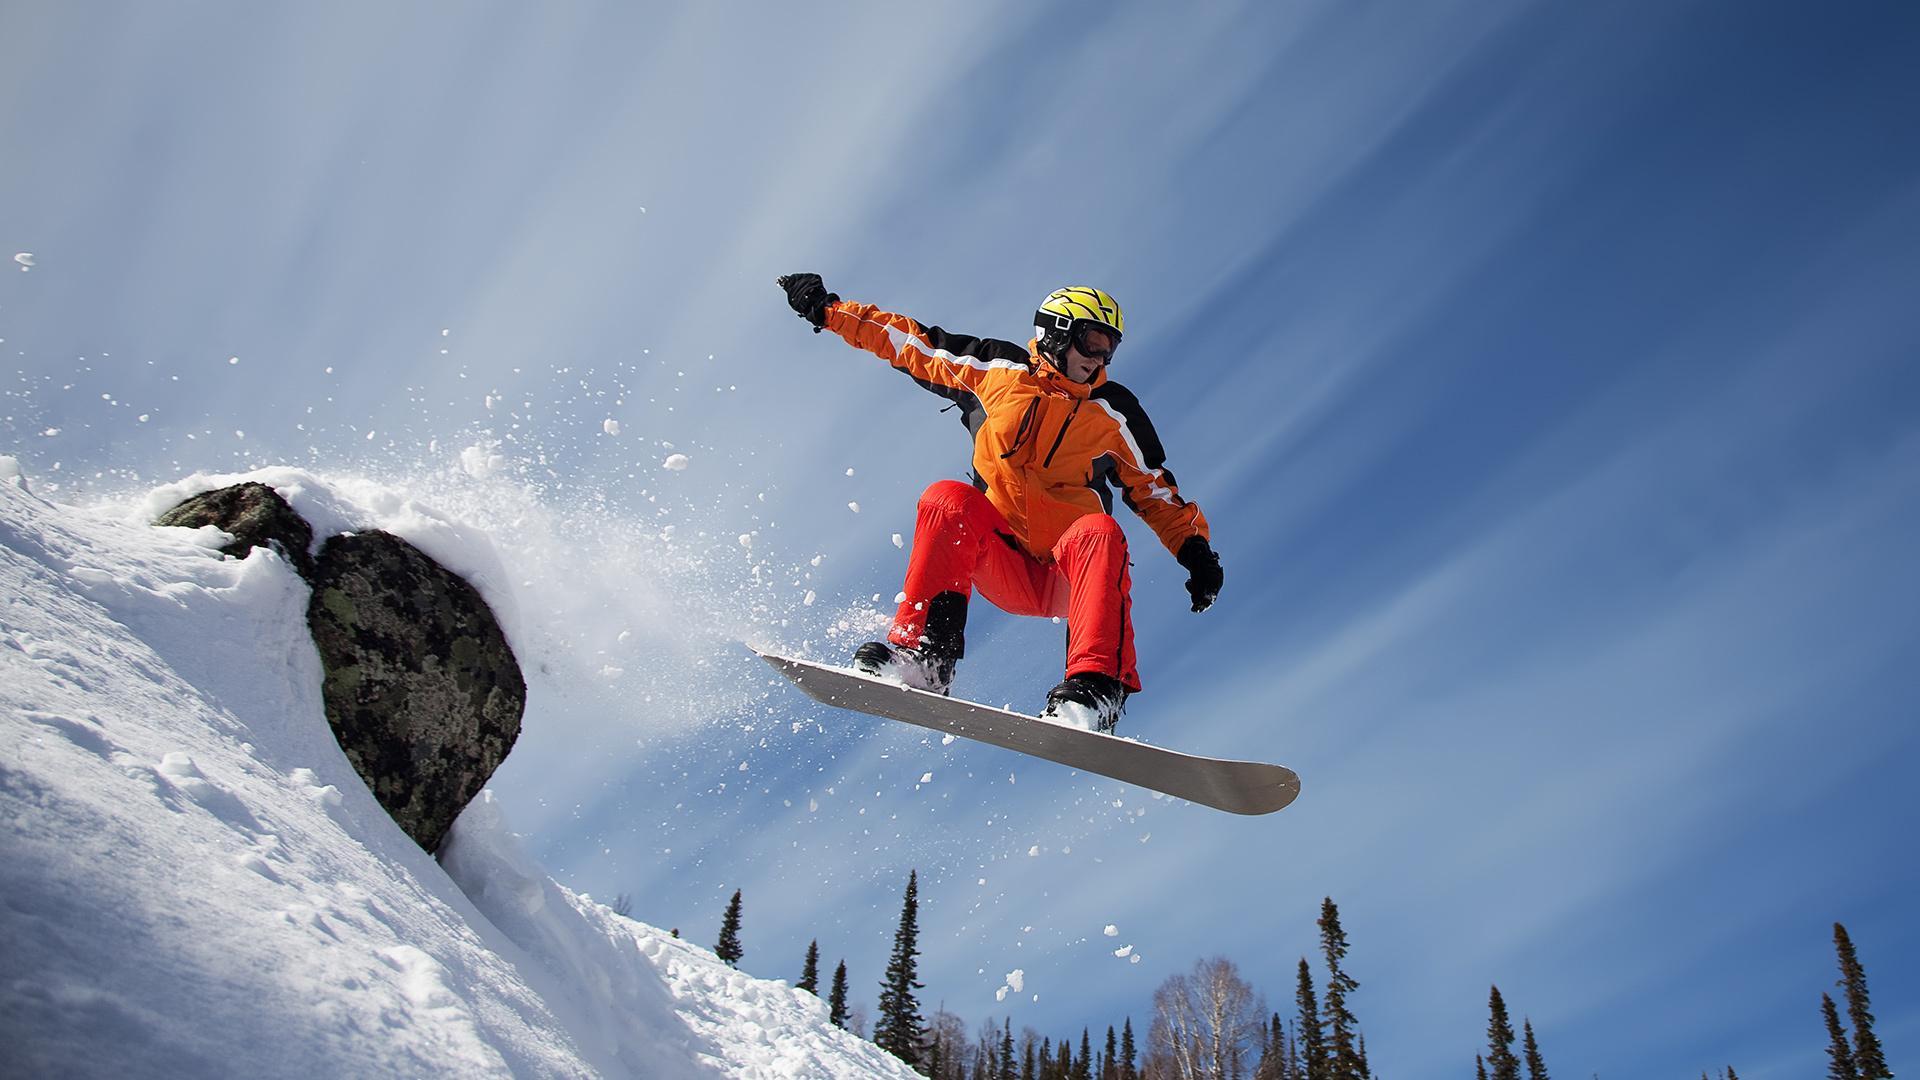 Спорт спорт сноуборд горы снег 1920x1080